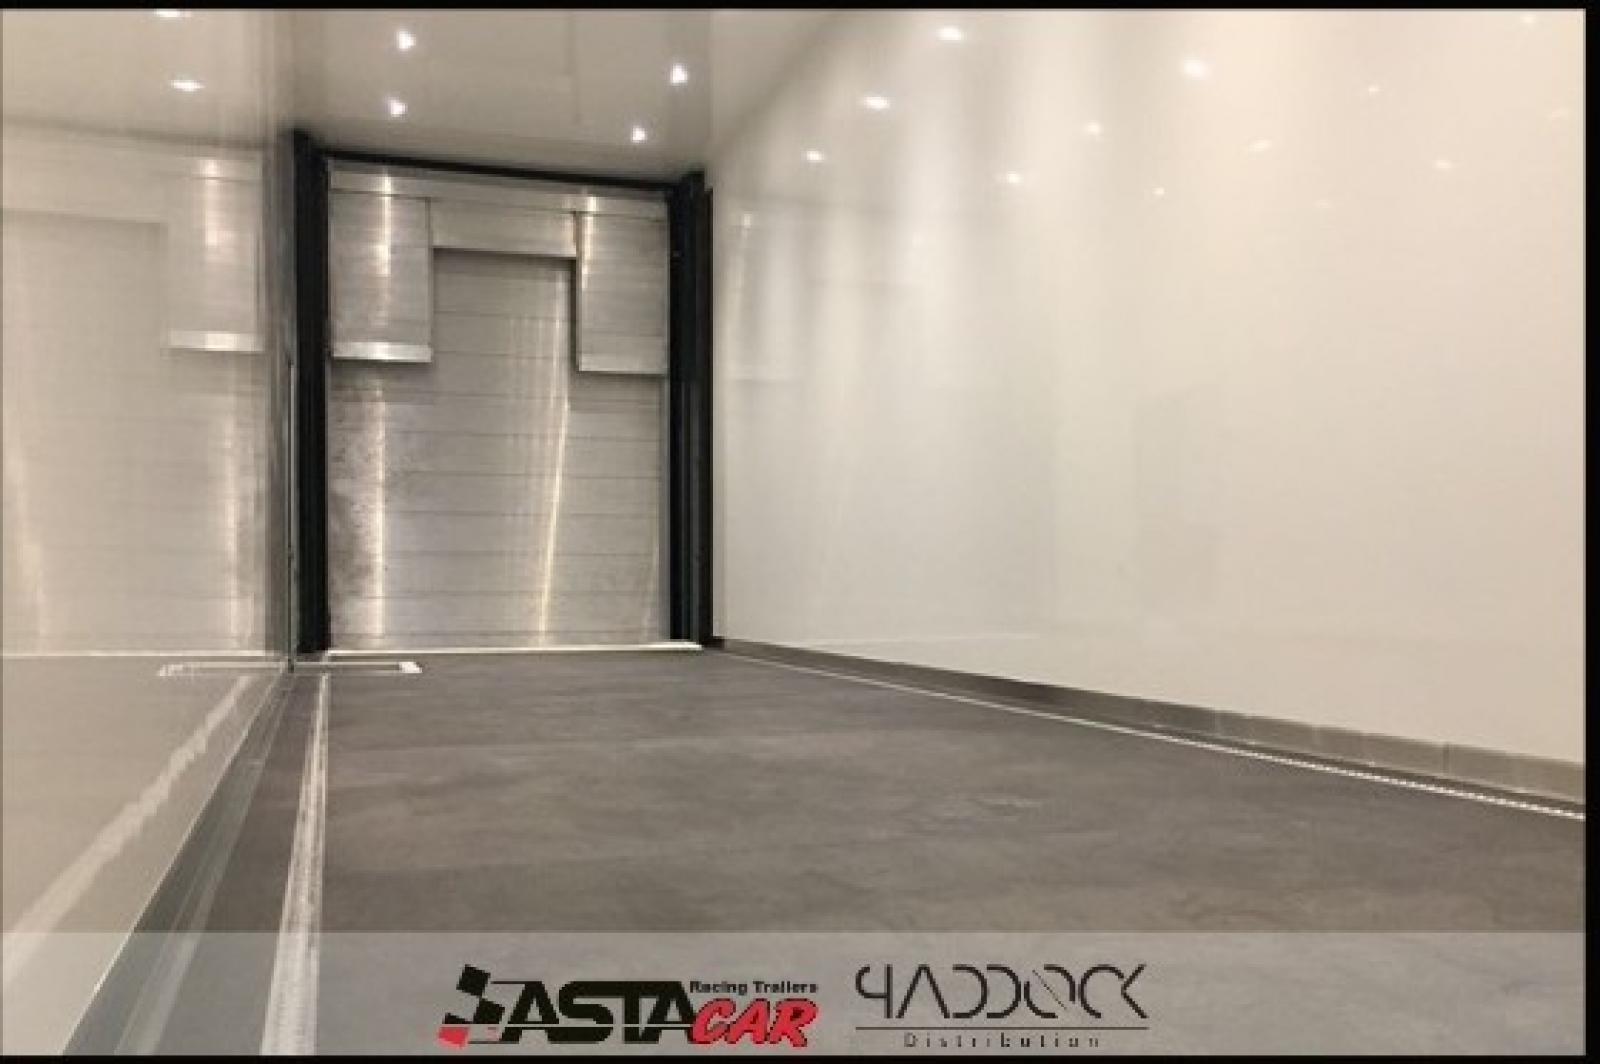 USED TRAILER ASTA CAR Y2 BY PADDOCK DISTRIBUTION - 5